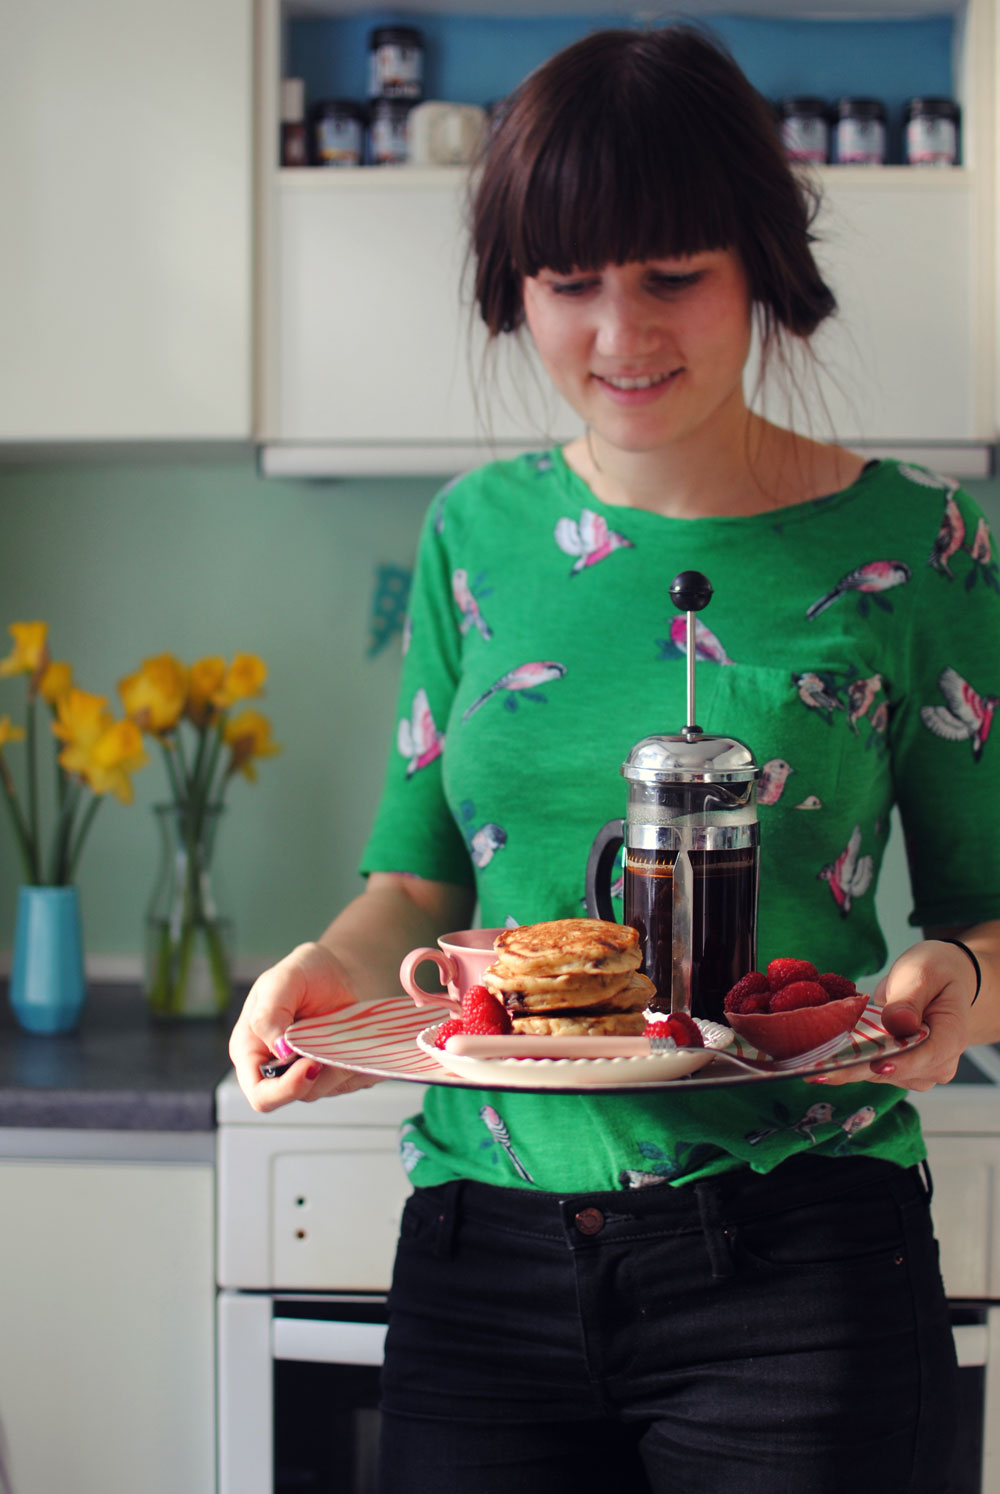 Opskrift: American pancakes med chokolade og banan | Frk. Kræsen